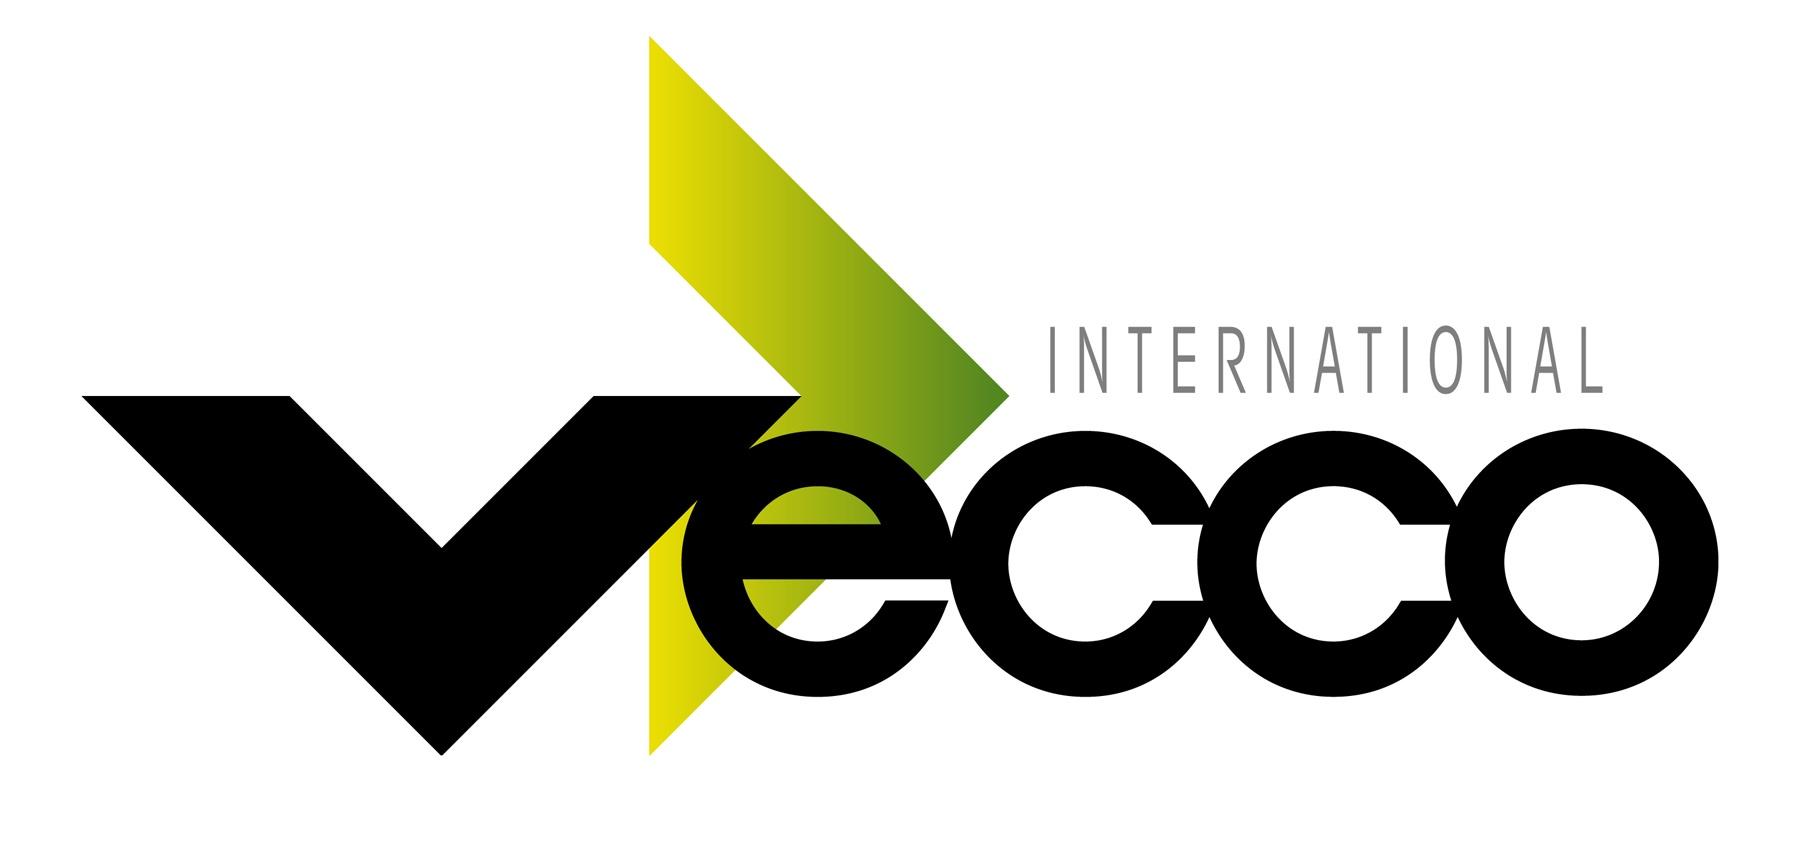 Vecco_Logo.jpg